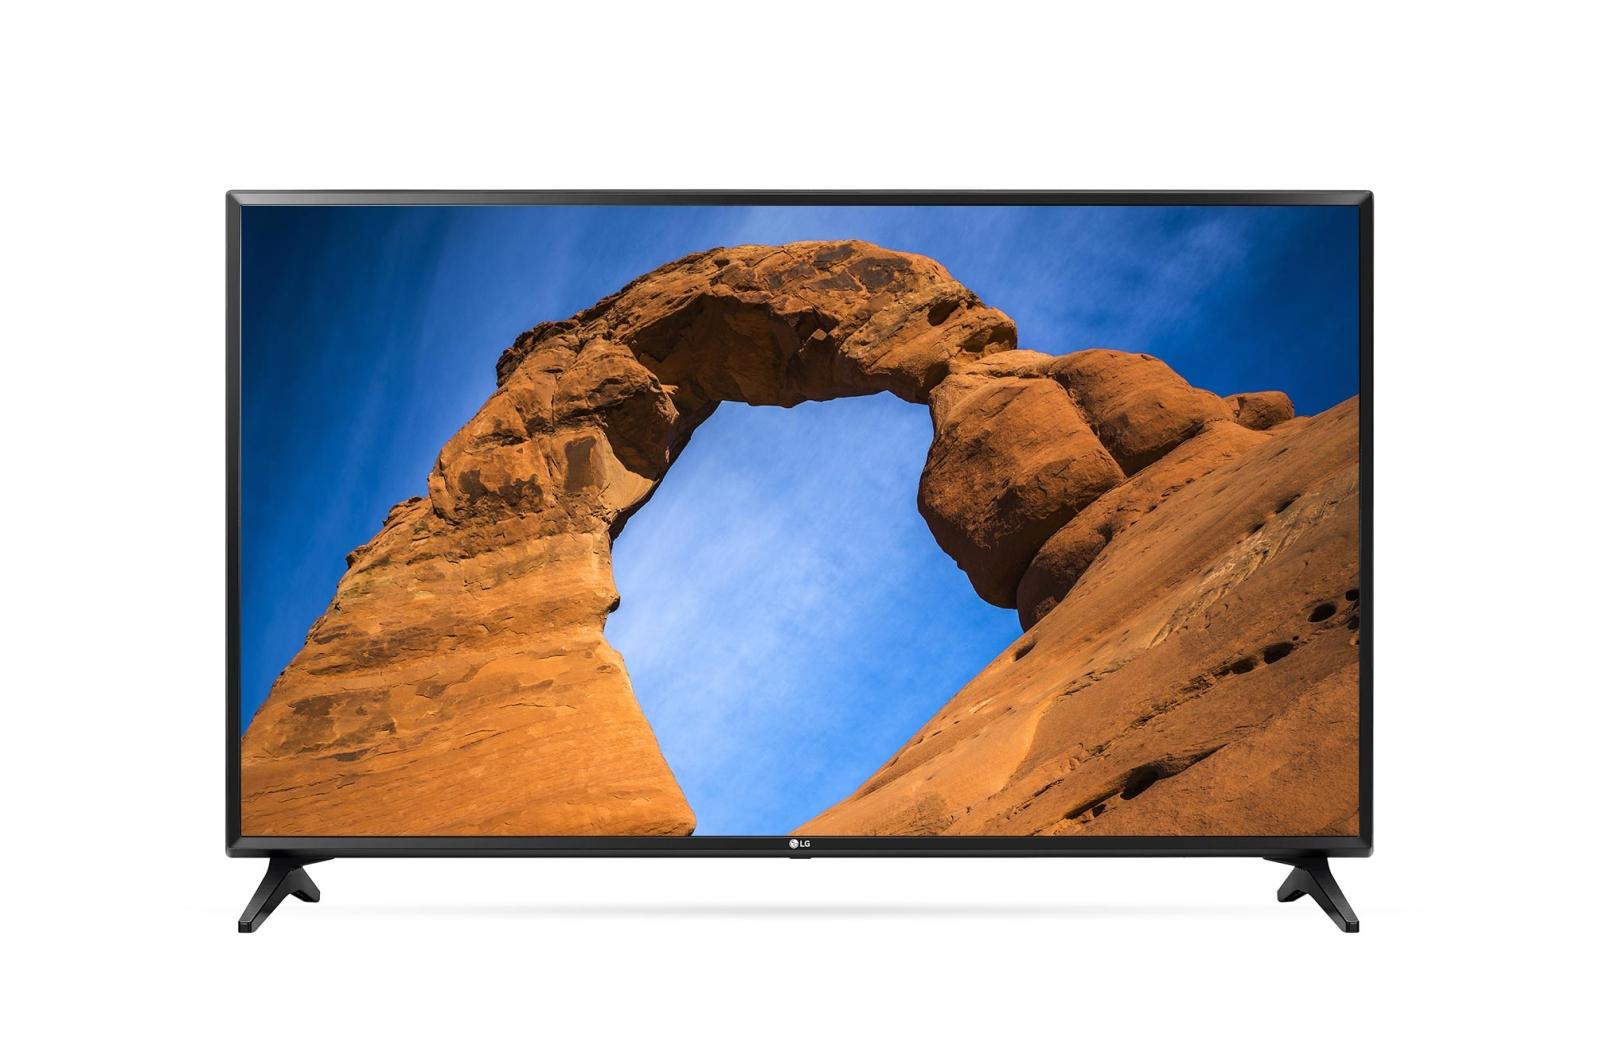 LG 49LK5900PLA LED TV 124.5 cm (49